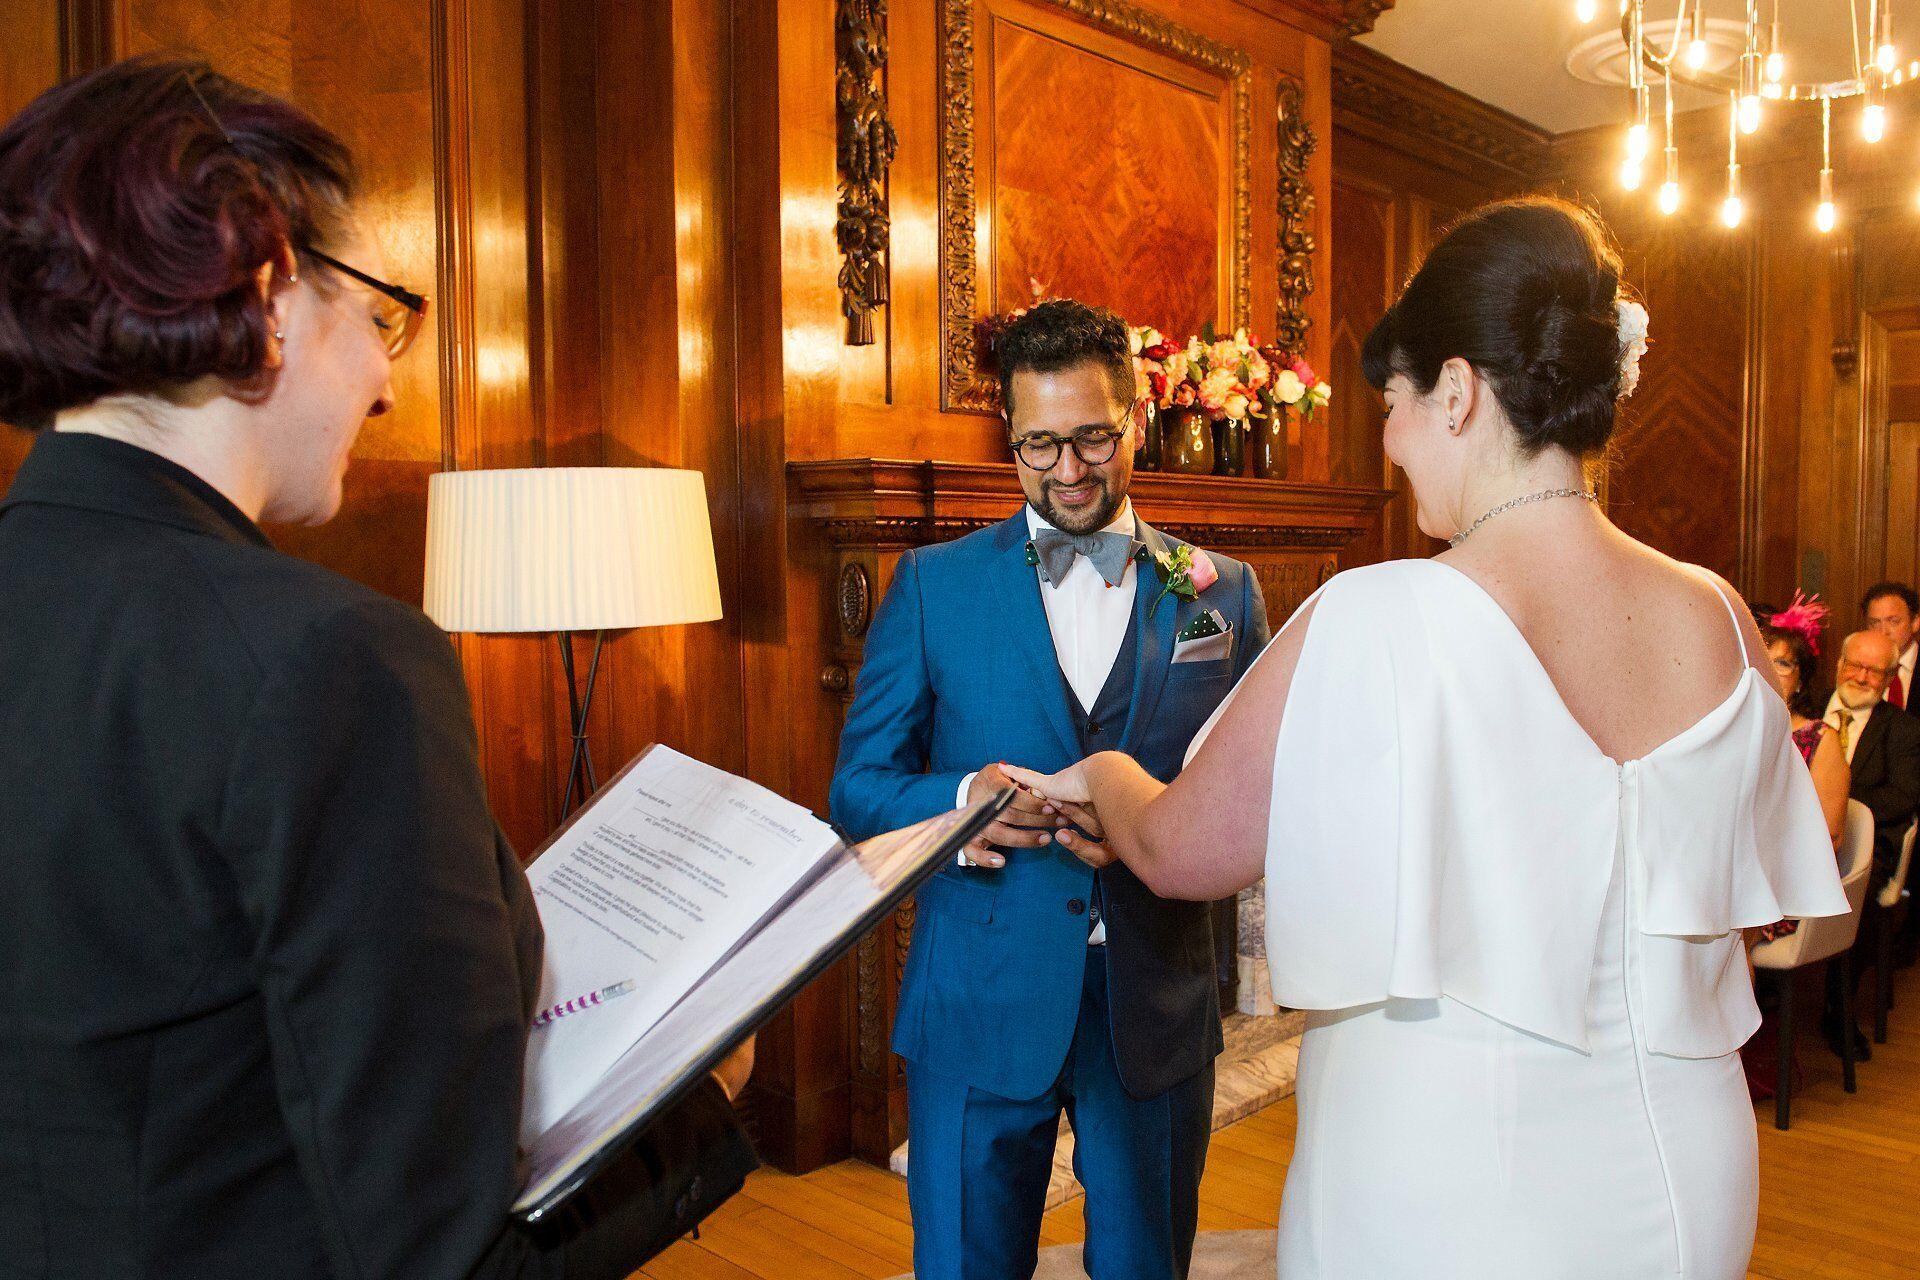 marylebone room civil wedding ceremony ring exchange with groom in vintage Donna Karan suit